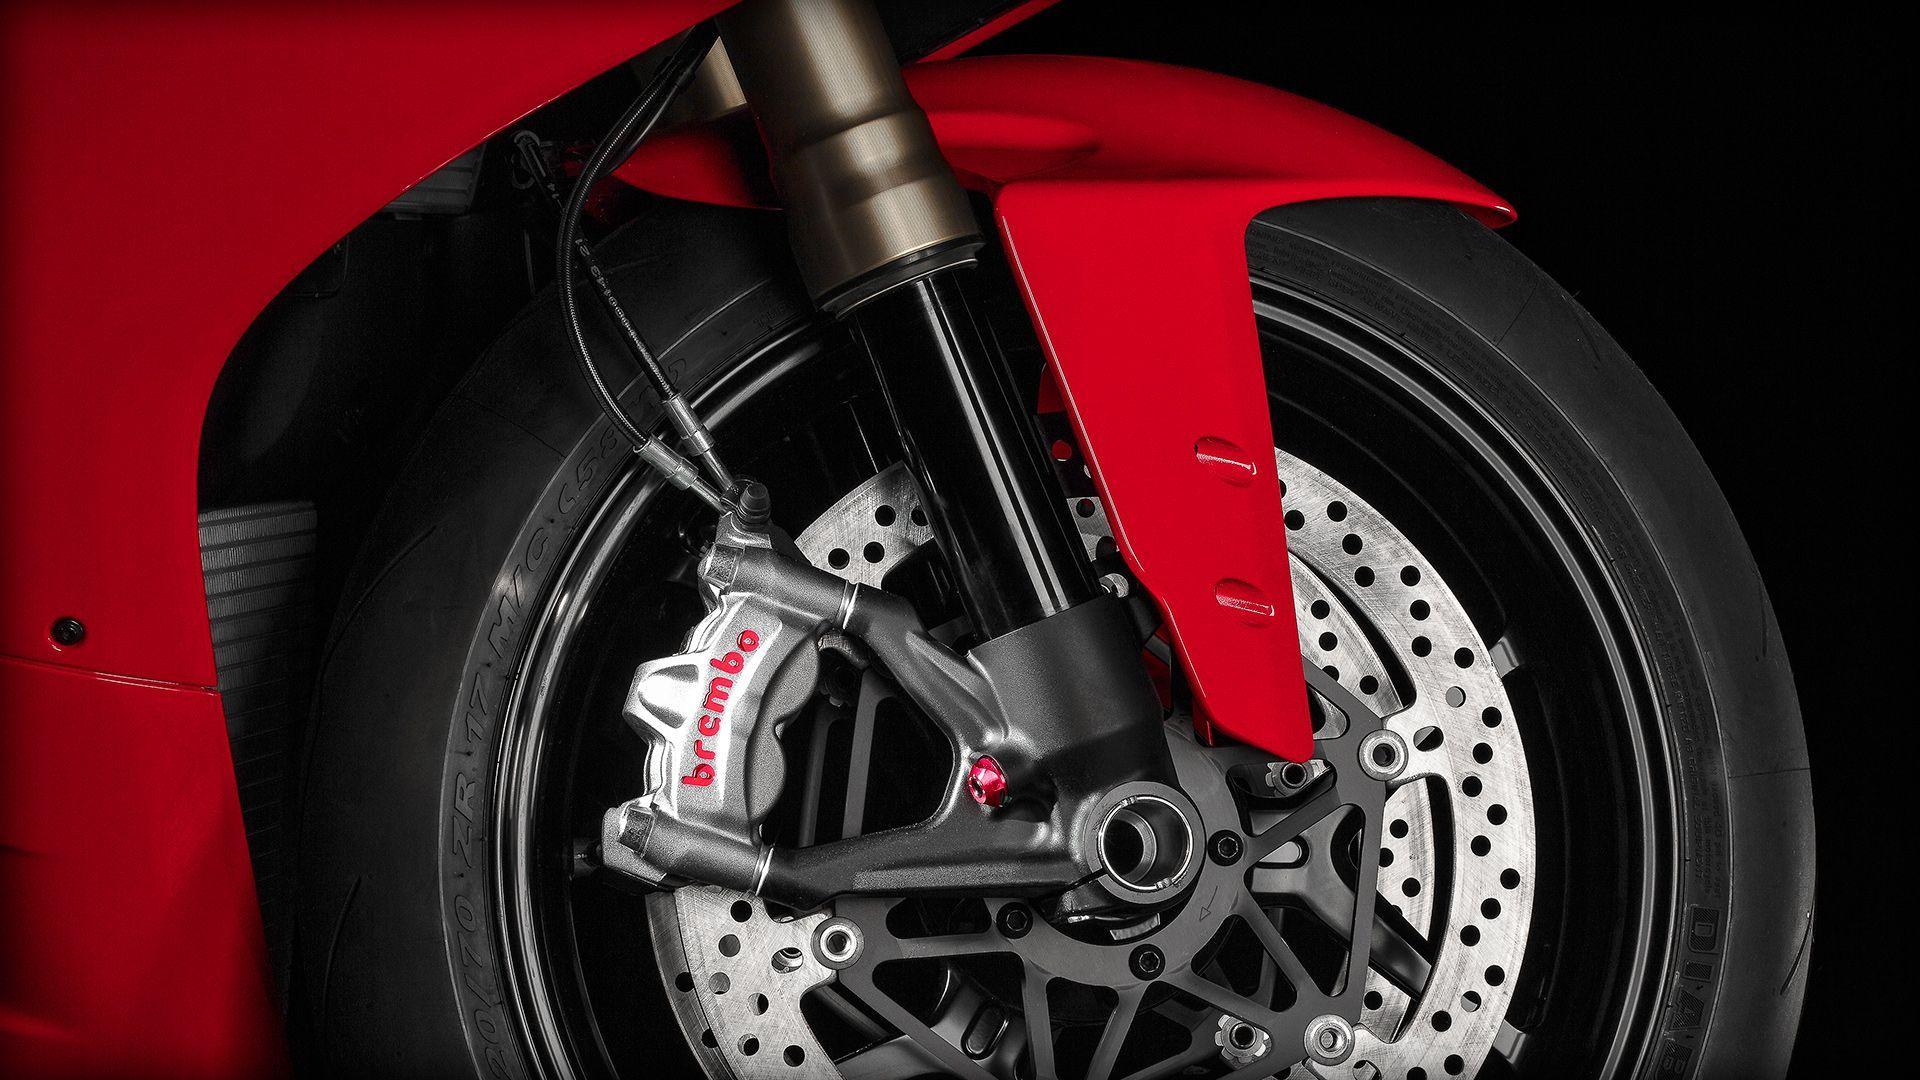 2015 Ducati 1299 Panigale   1299 Panigale - Brembo